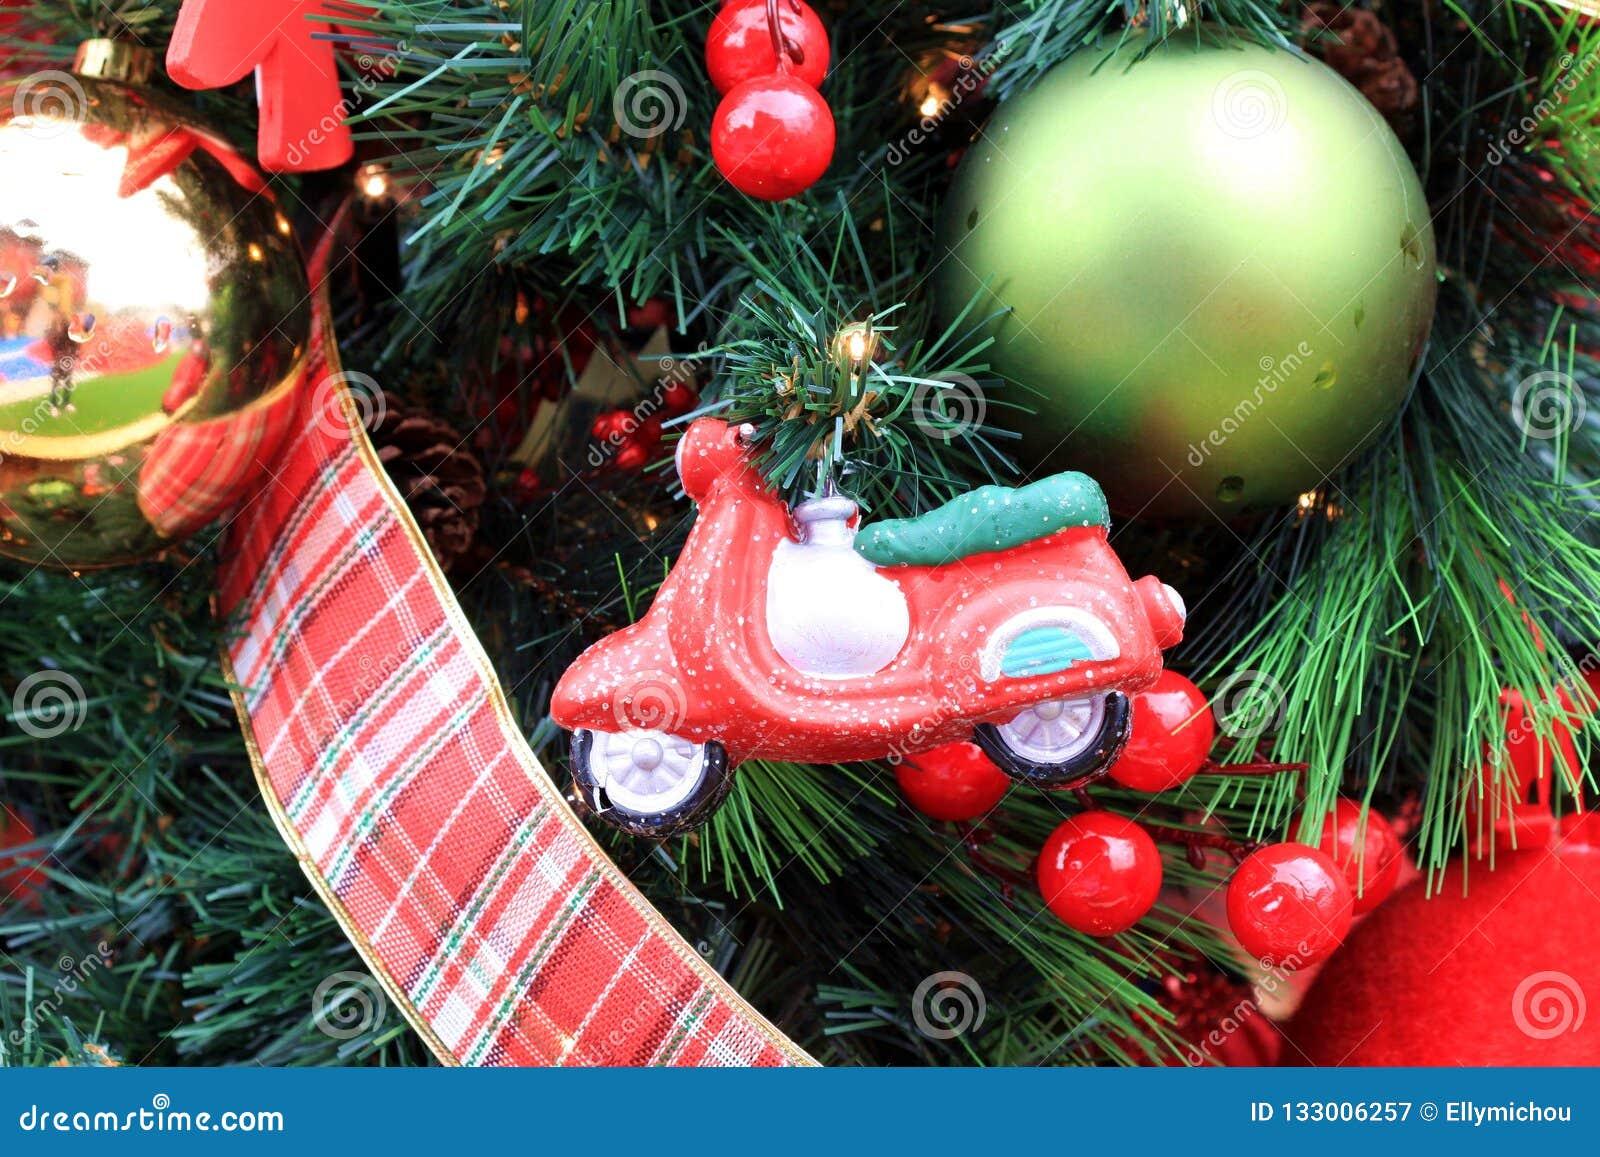 Christmas Toys Ornaments Garland Ribbon Stock Image Image Of